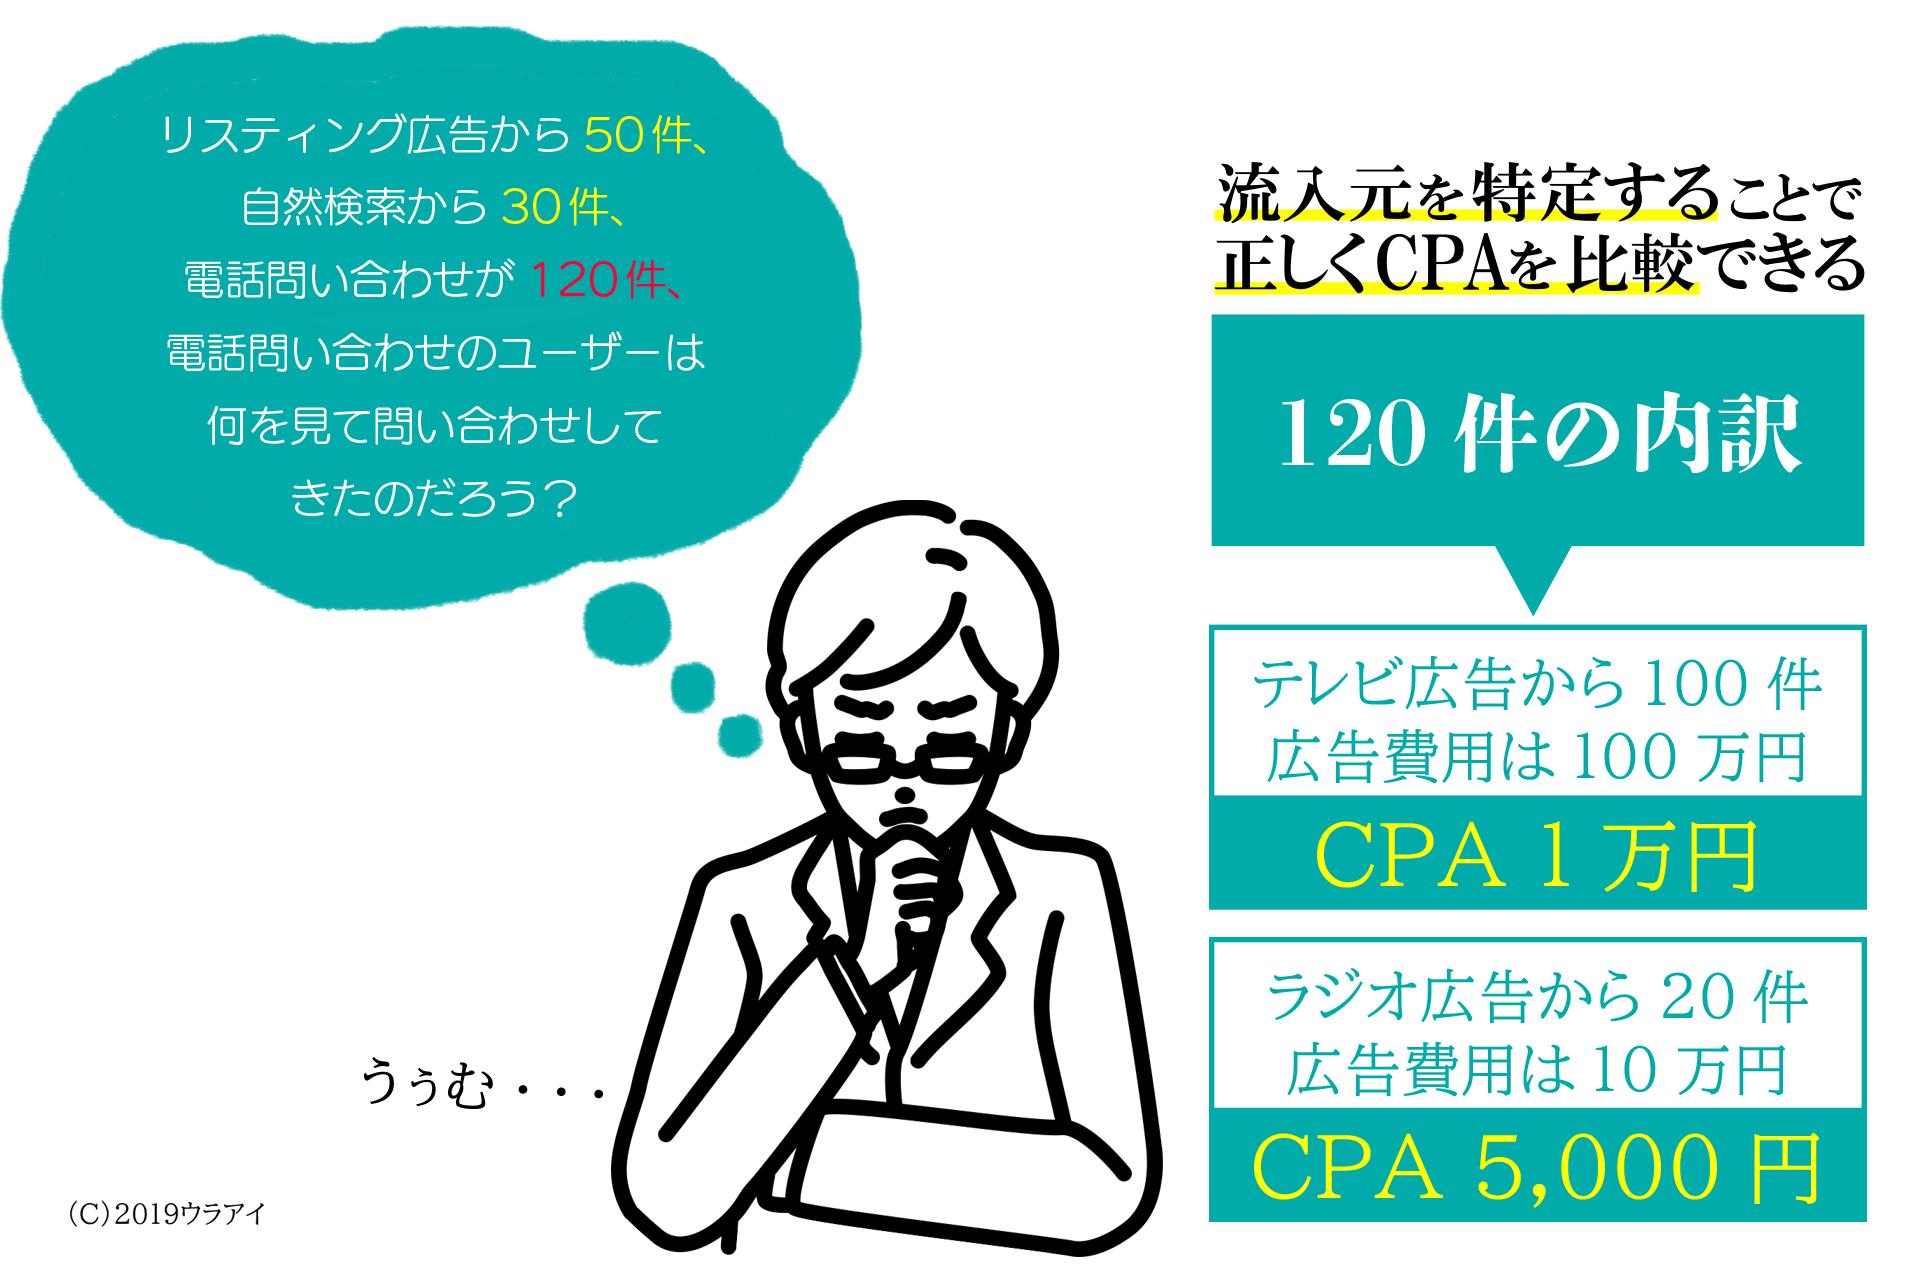 CPAを正しく把握